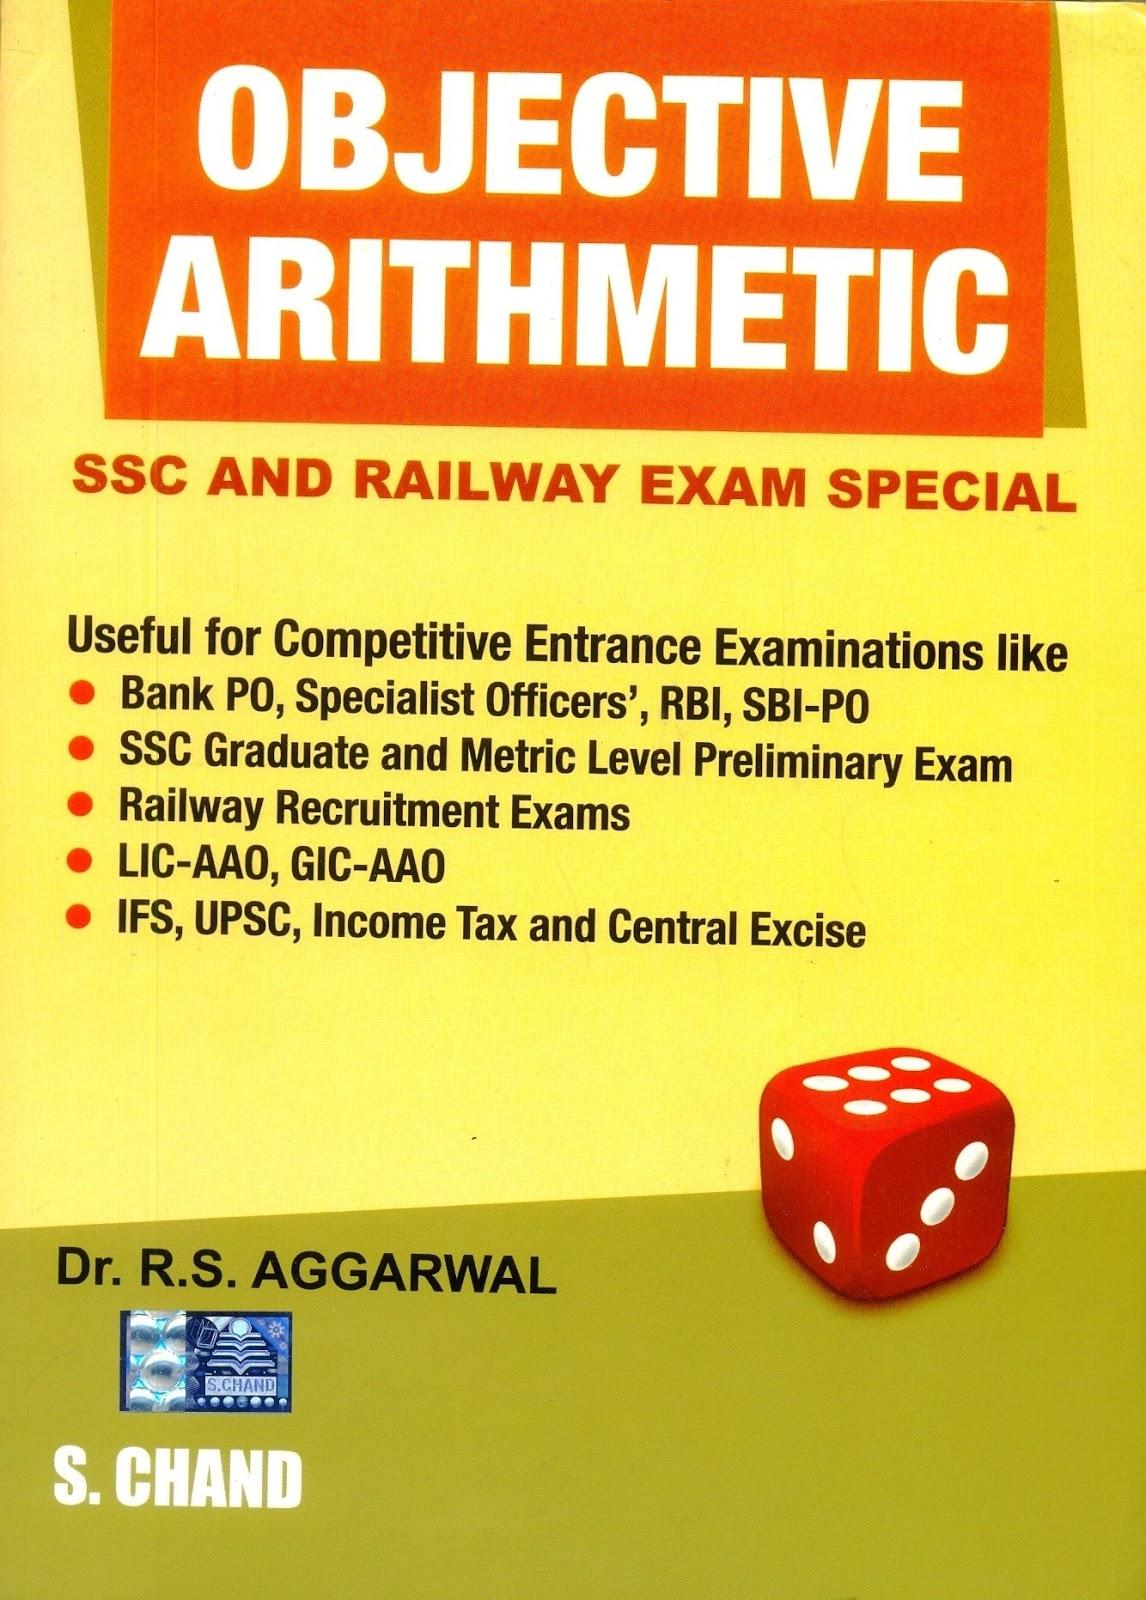 Rs agarwal math book download